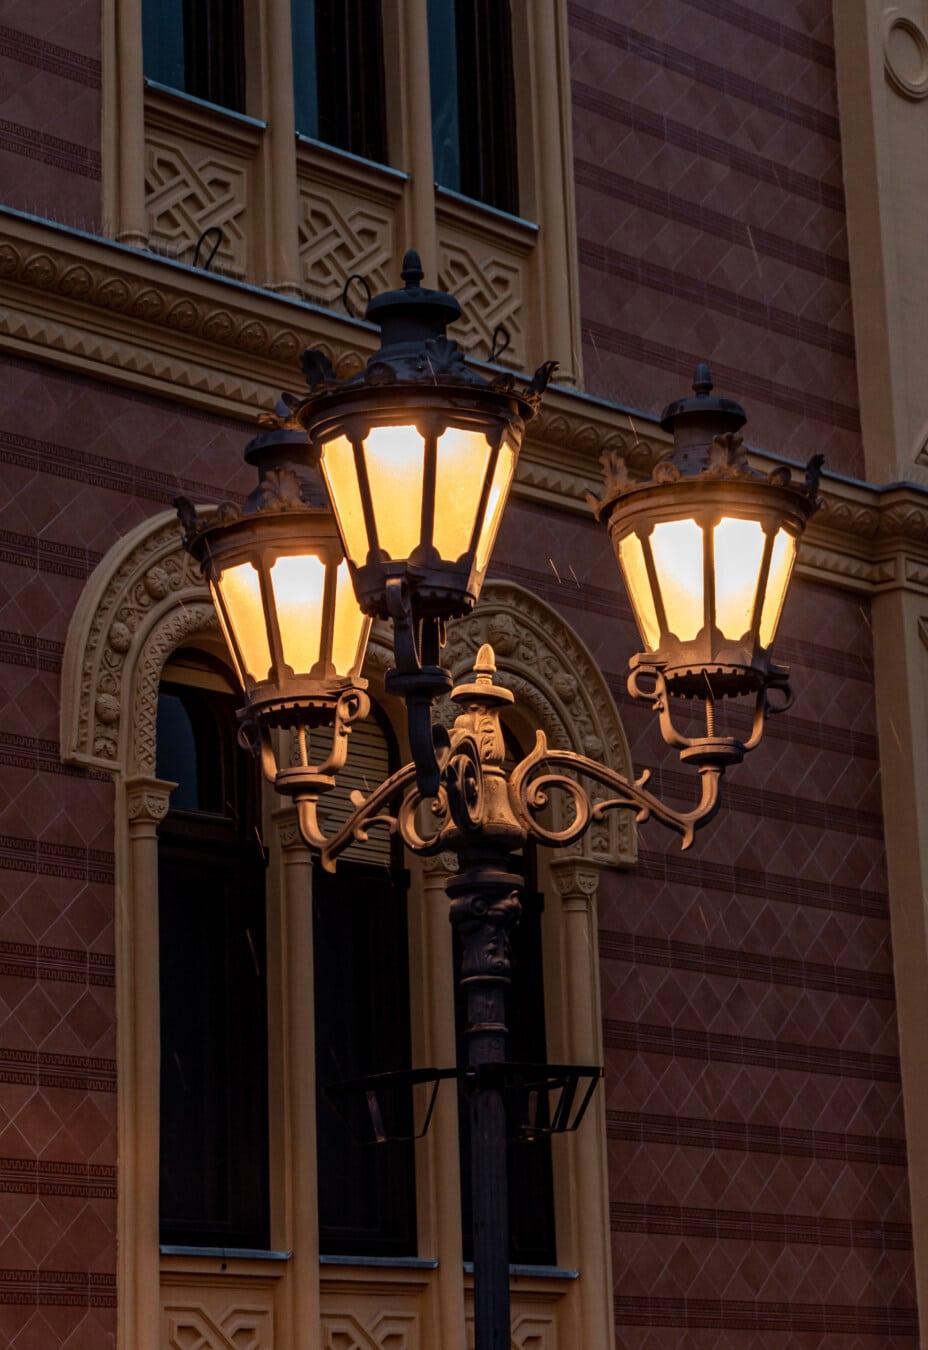 lamp, street, classic, cast iron, baroque, lantern, evening, rain, architecture, building